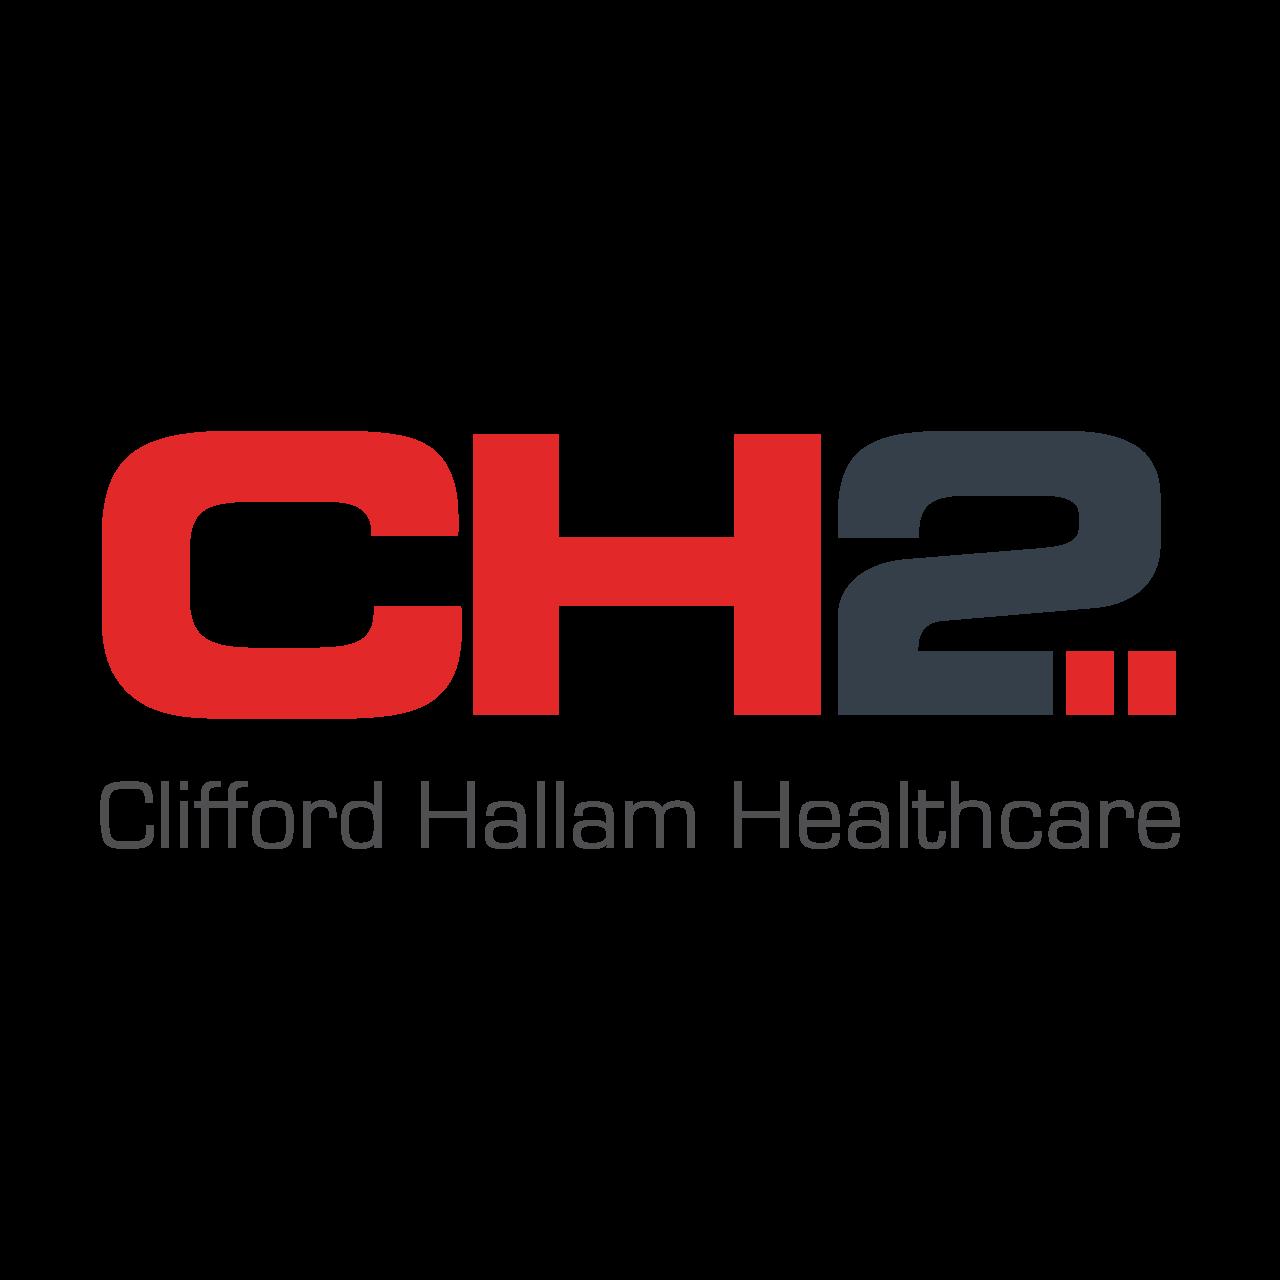 Clifford Hallam